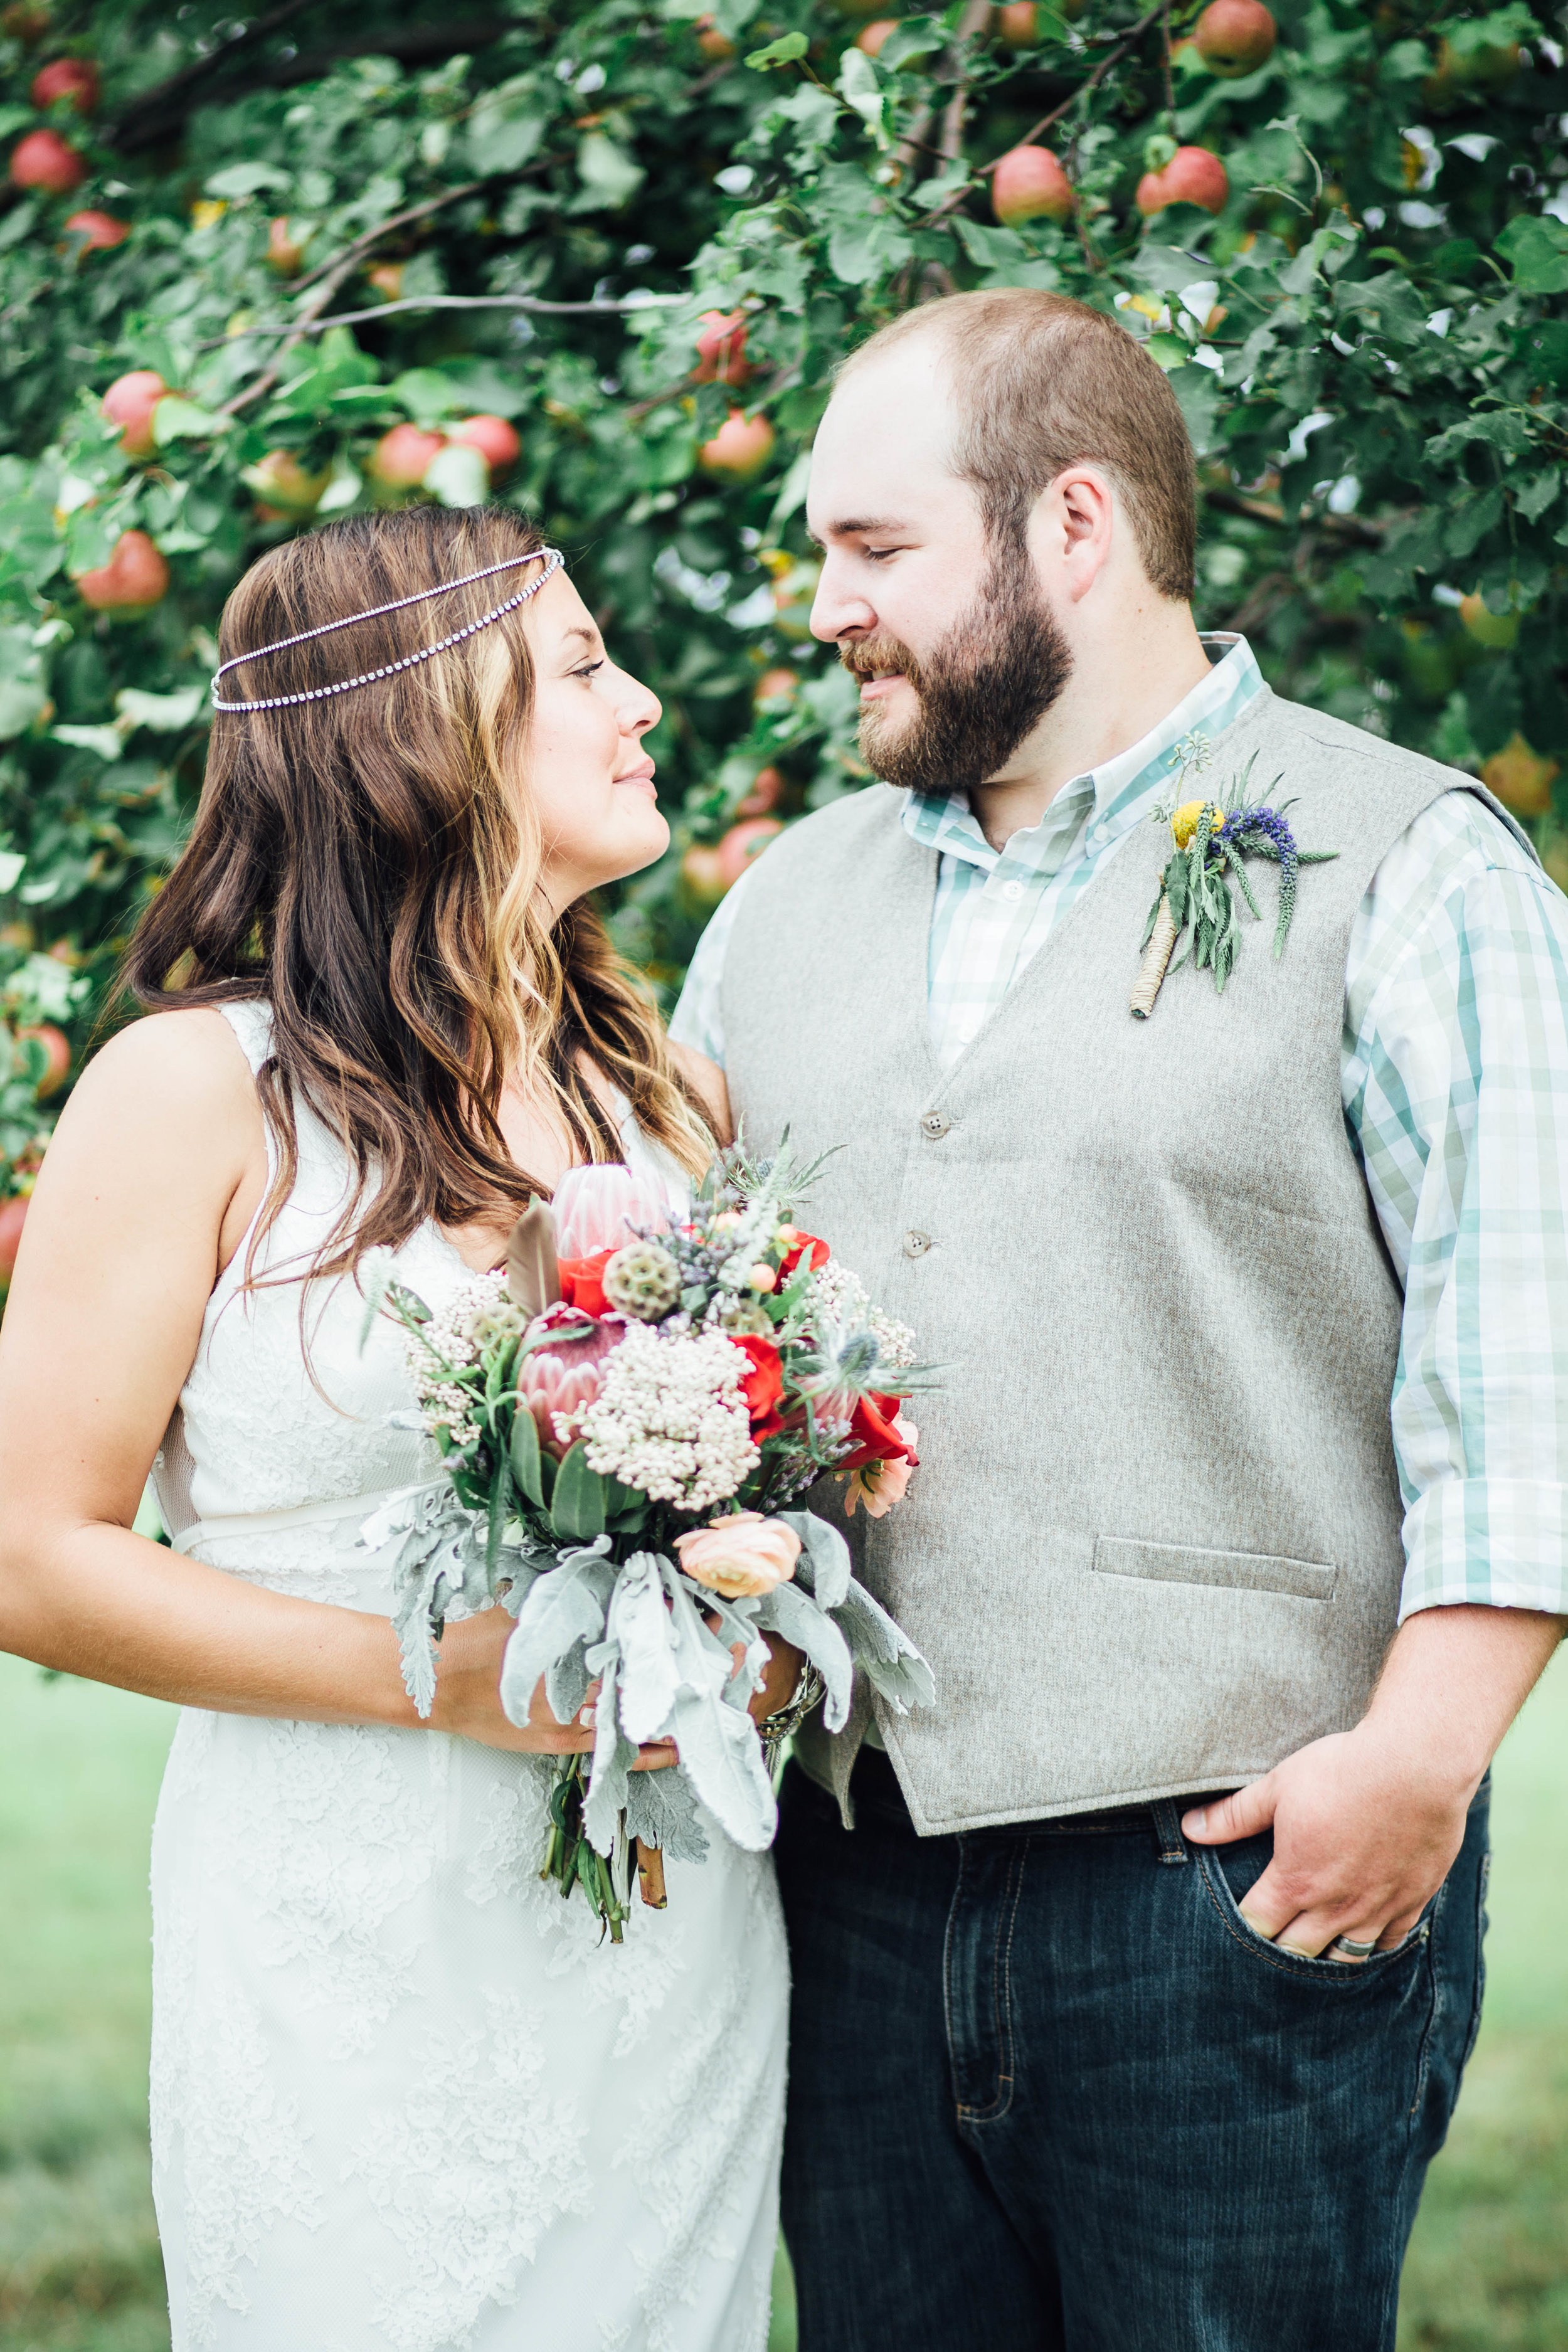 Bohemian Wedding - Sabrina Leigh Studios - Northern Michigan Wedding Photographer059.jpg